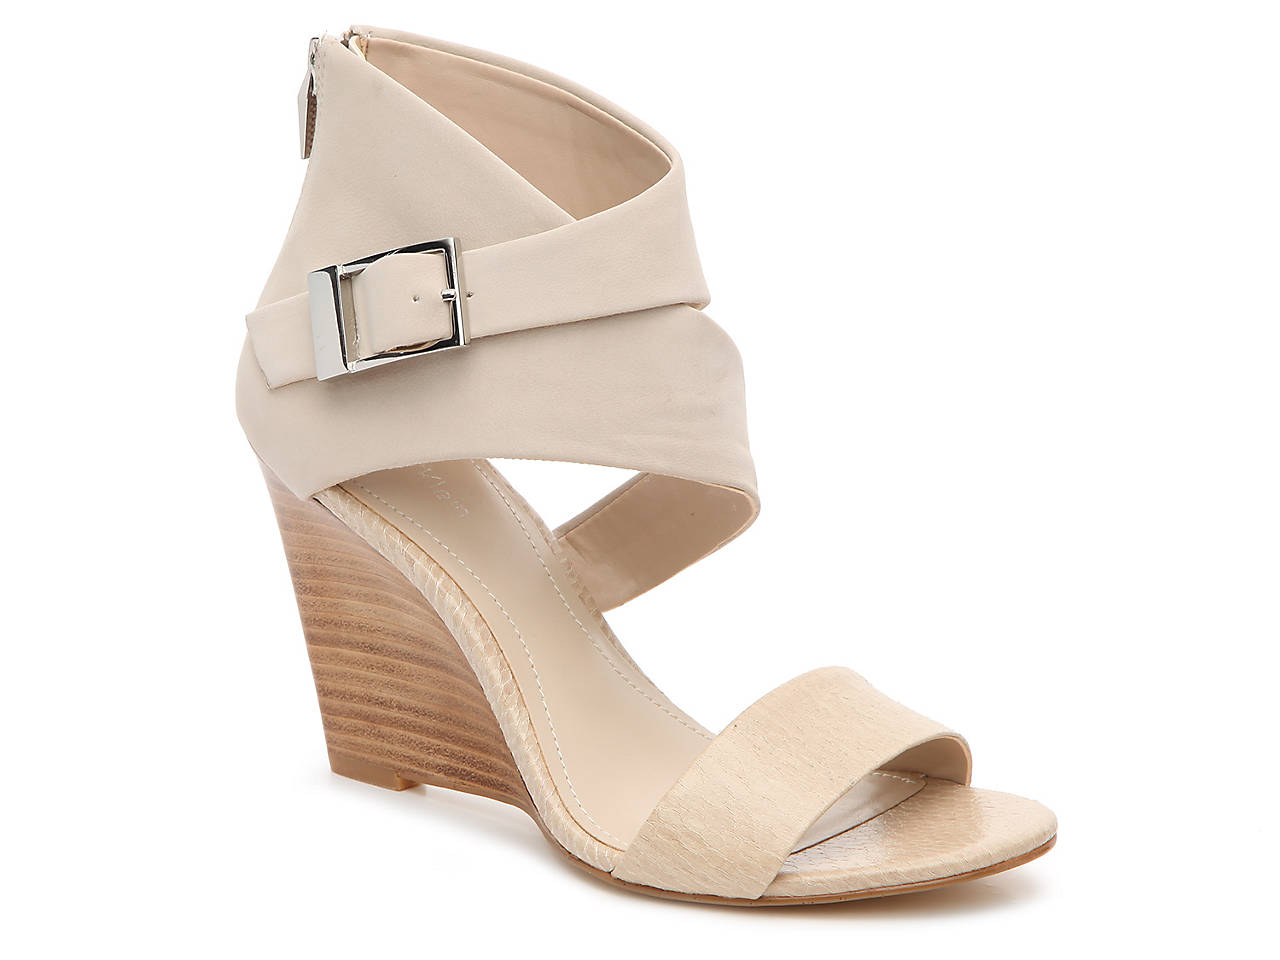 e58a8bff091 Calvin Klein Marisa Wedge Sandal Women s Shoes